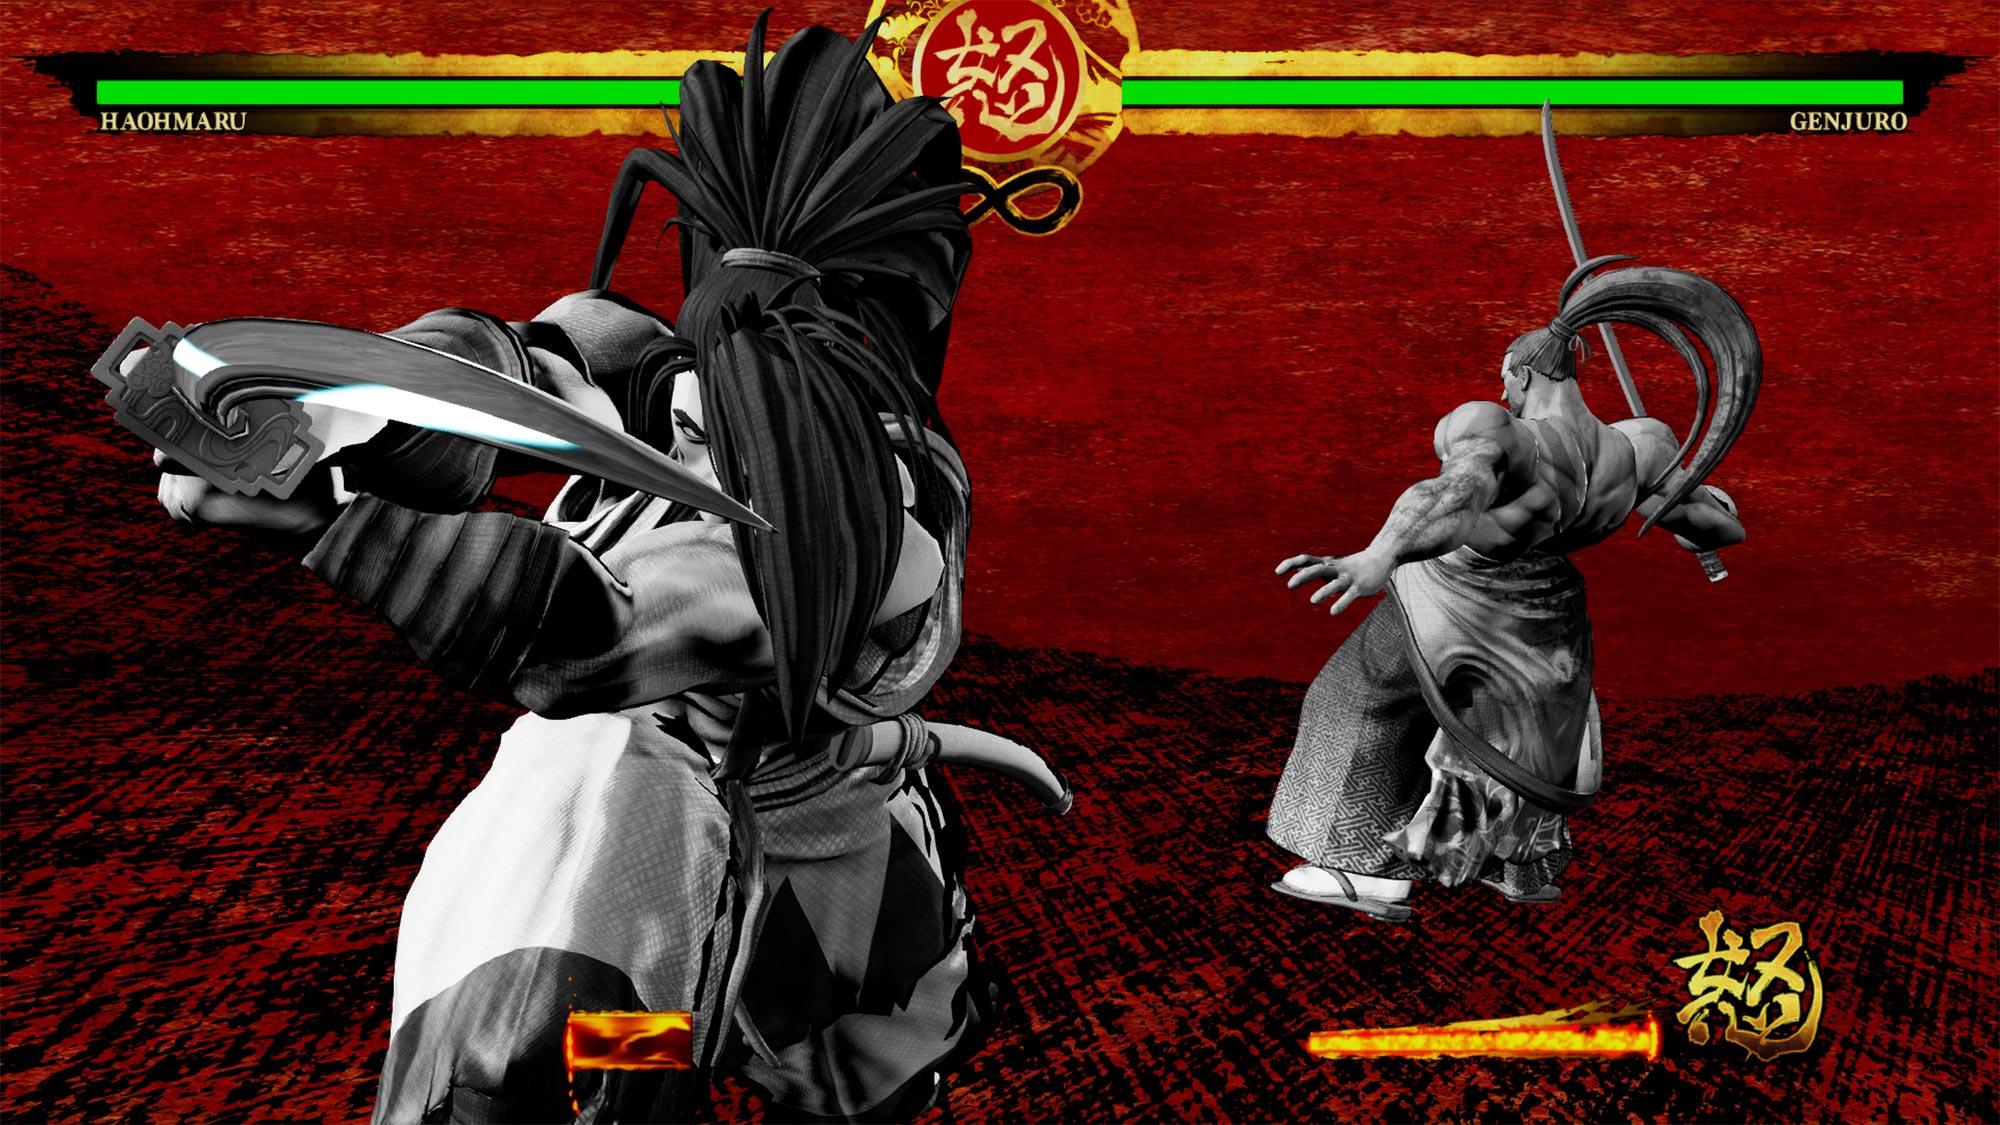 Samurai Shodown screenshots 3 out of 11 image gallery